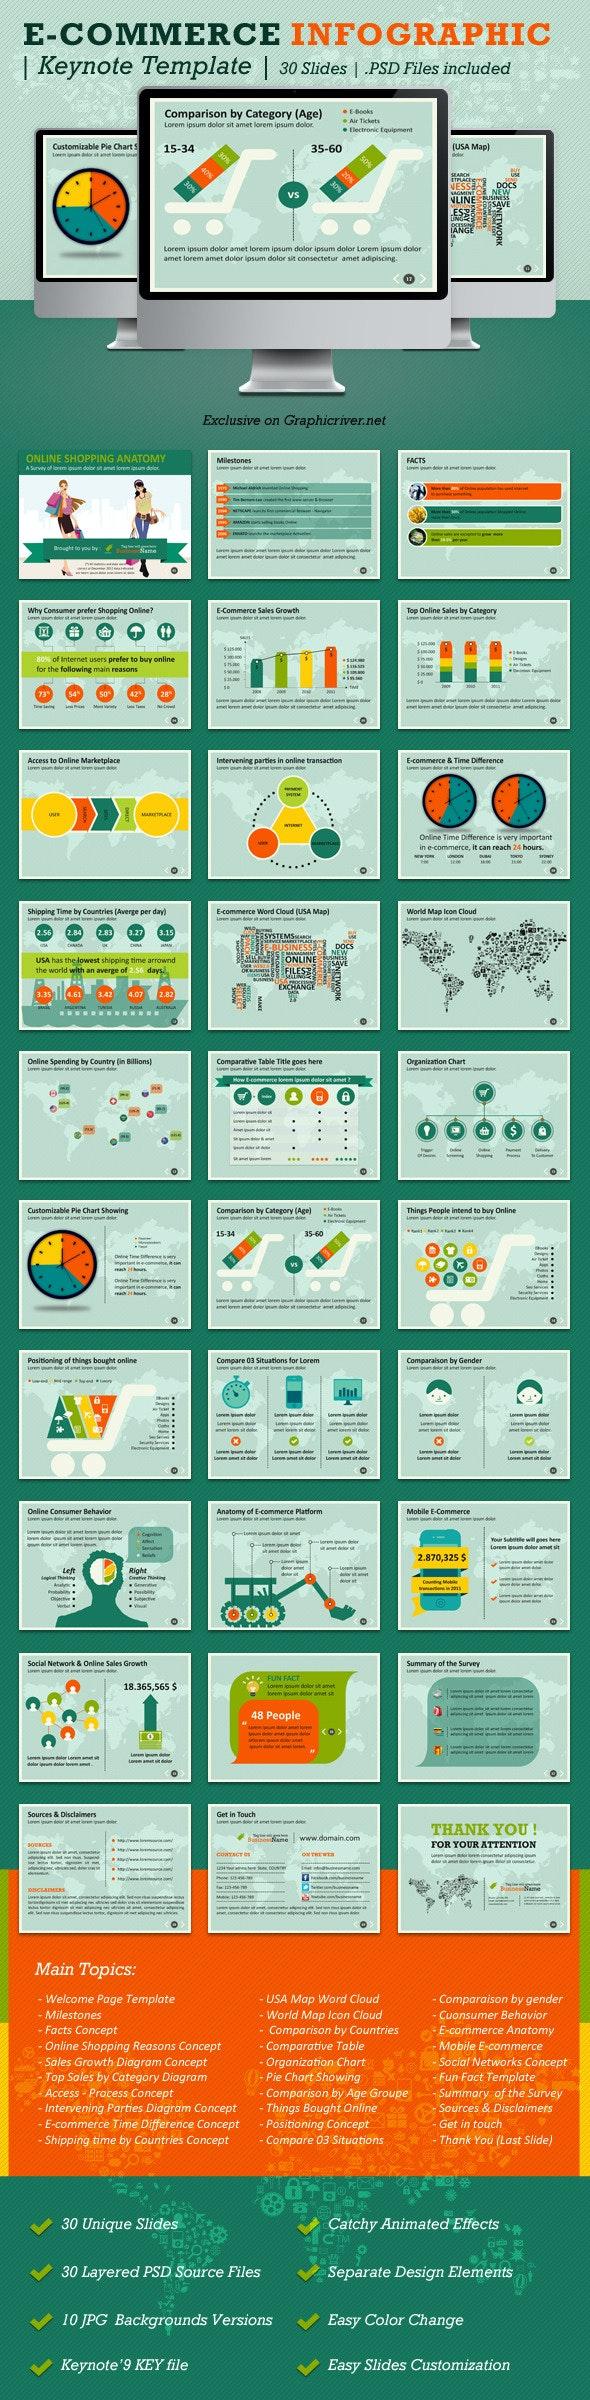 E-Commerce Infographic Keynote Template  - Creative Keynote Templates